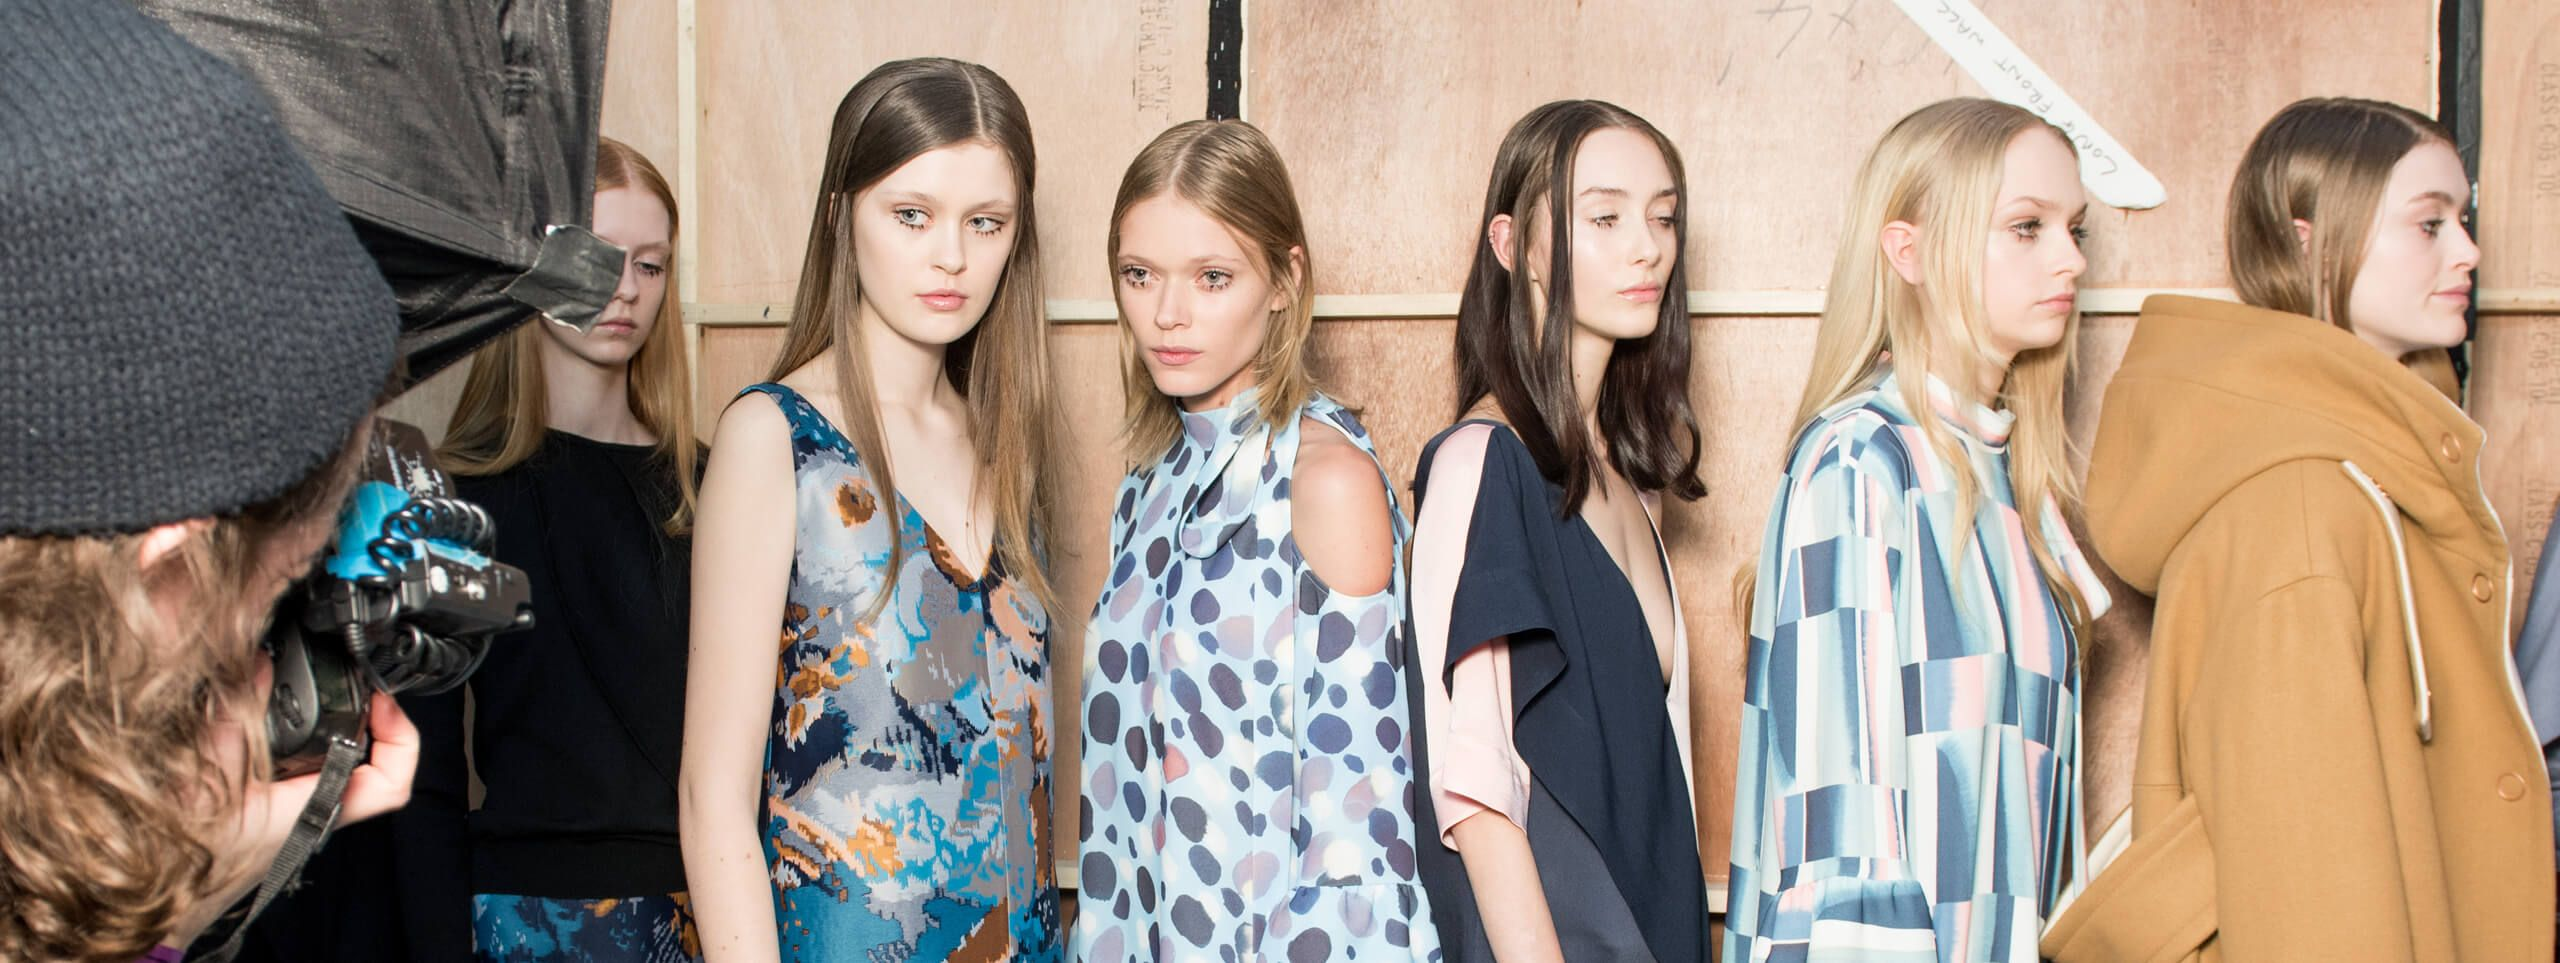 Models showcase short, medium and long hairstyles